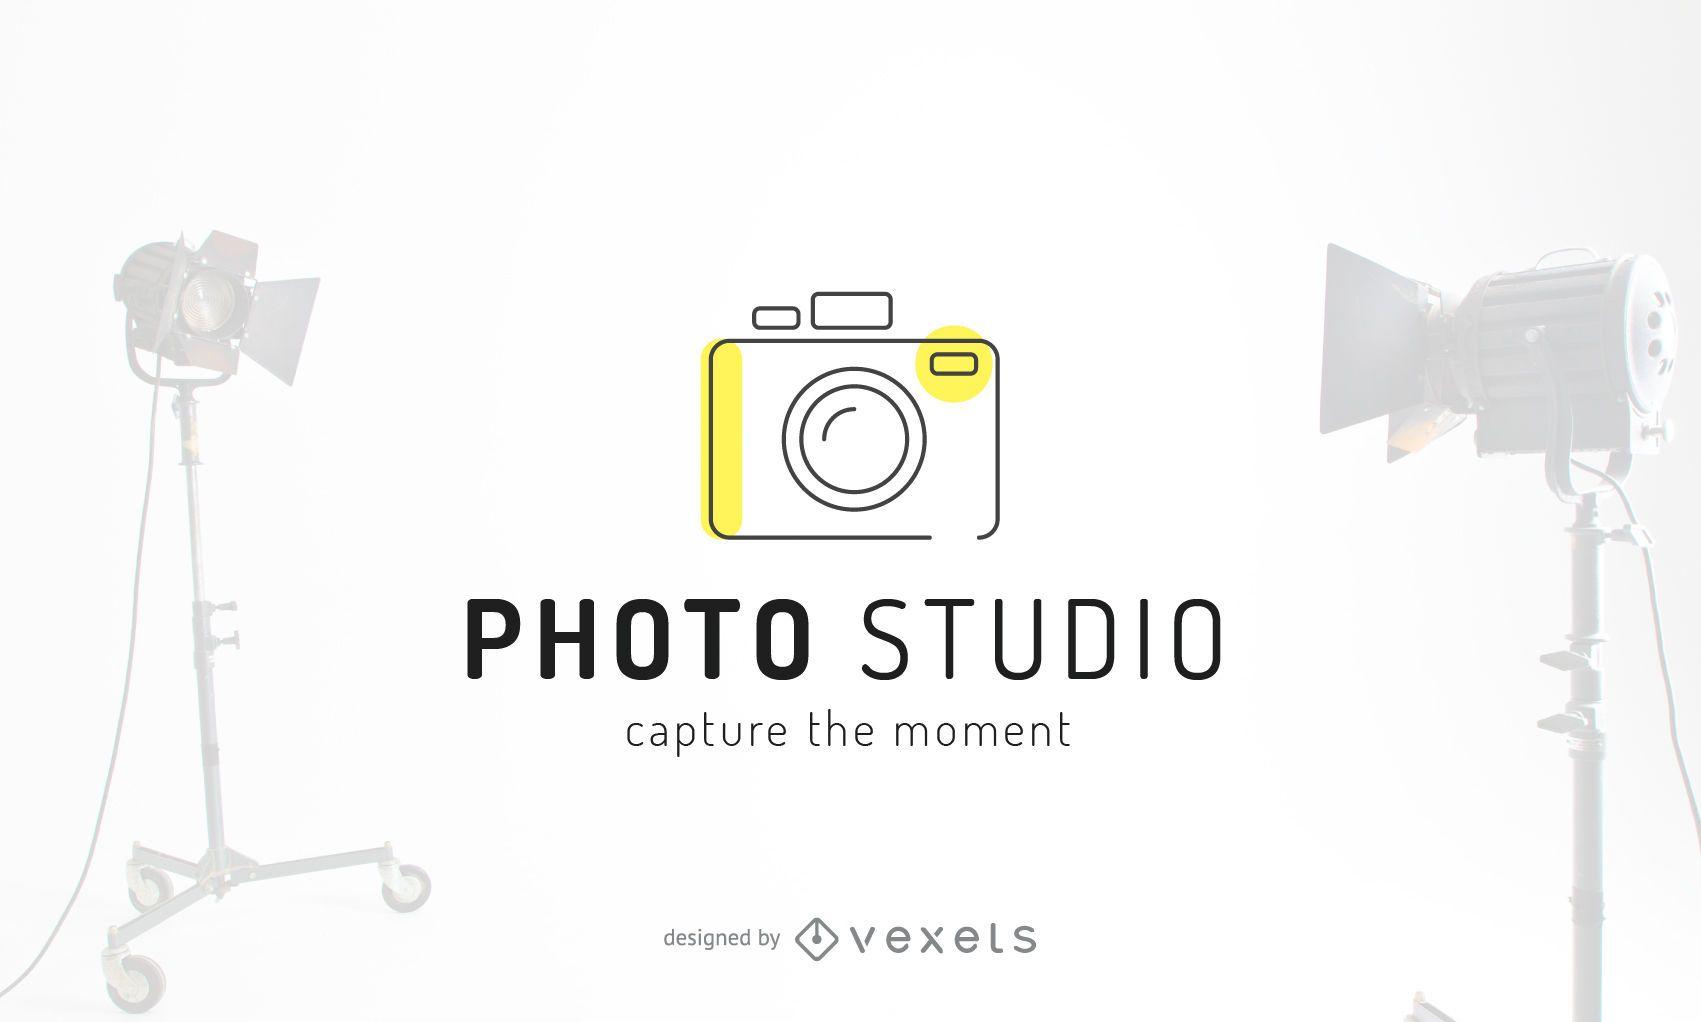 Photo studio logo template design